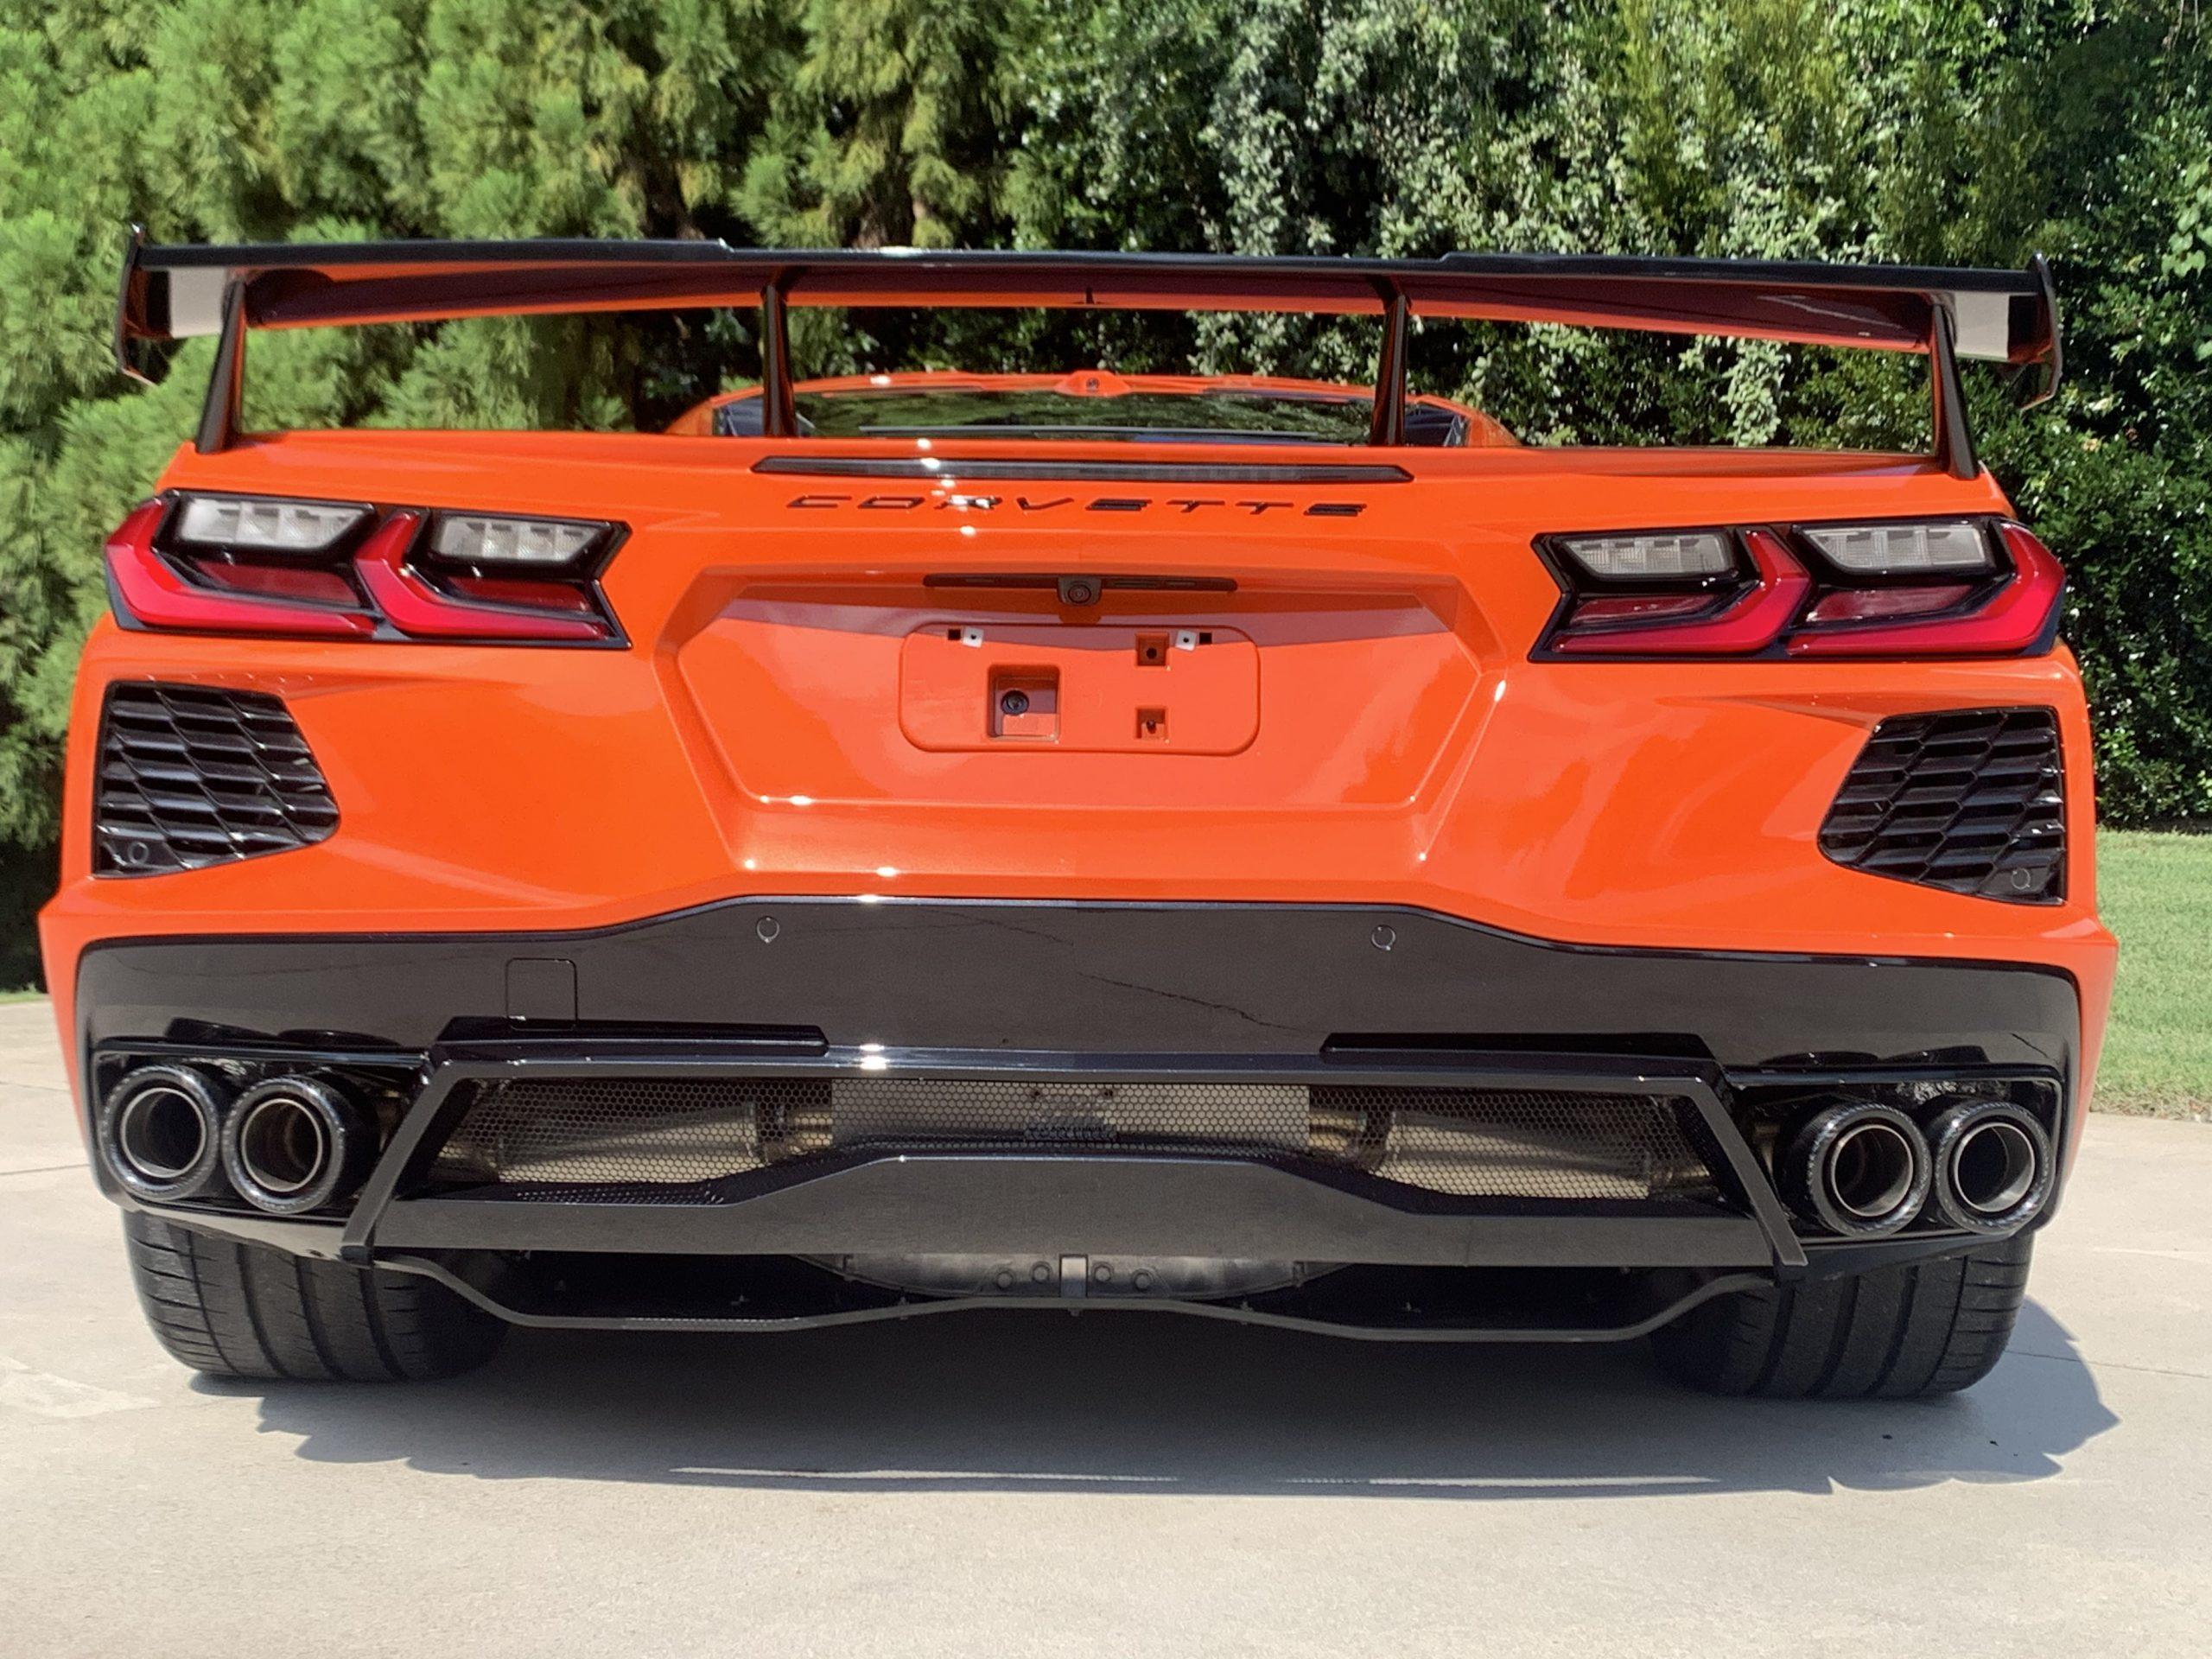 chevy c8 corvette stingray fusion exhaust system fcor 0750 4 5 carbon fiber tips